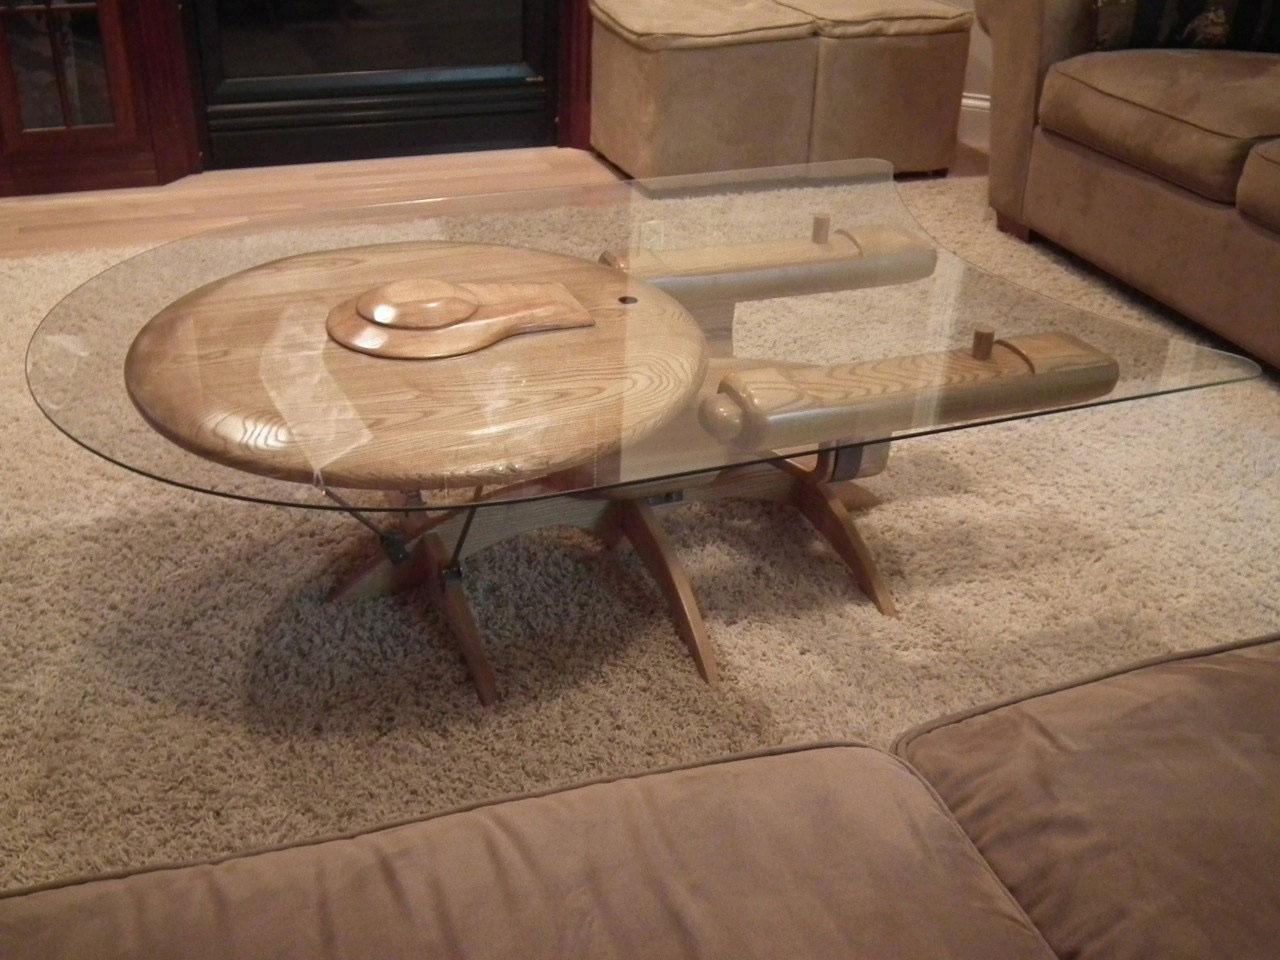 Star Trek USS Enterprise NCC 1701 C Coffee Table